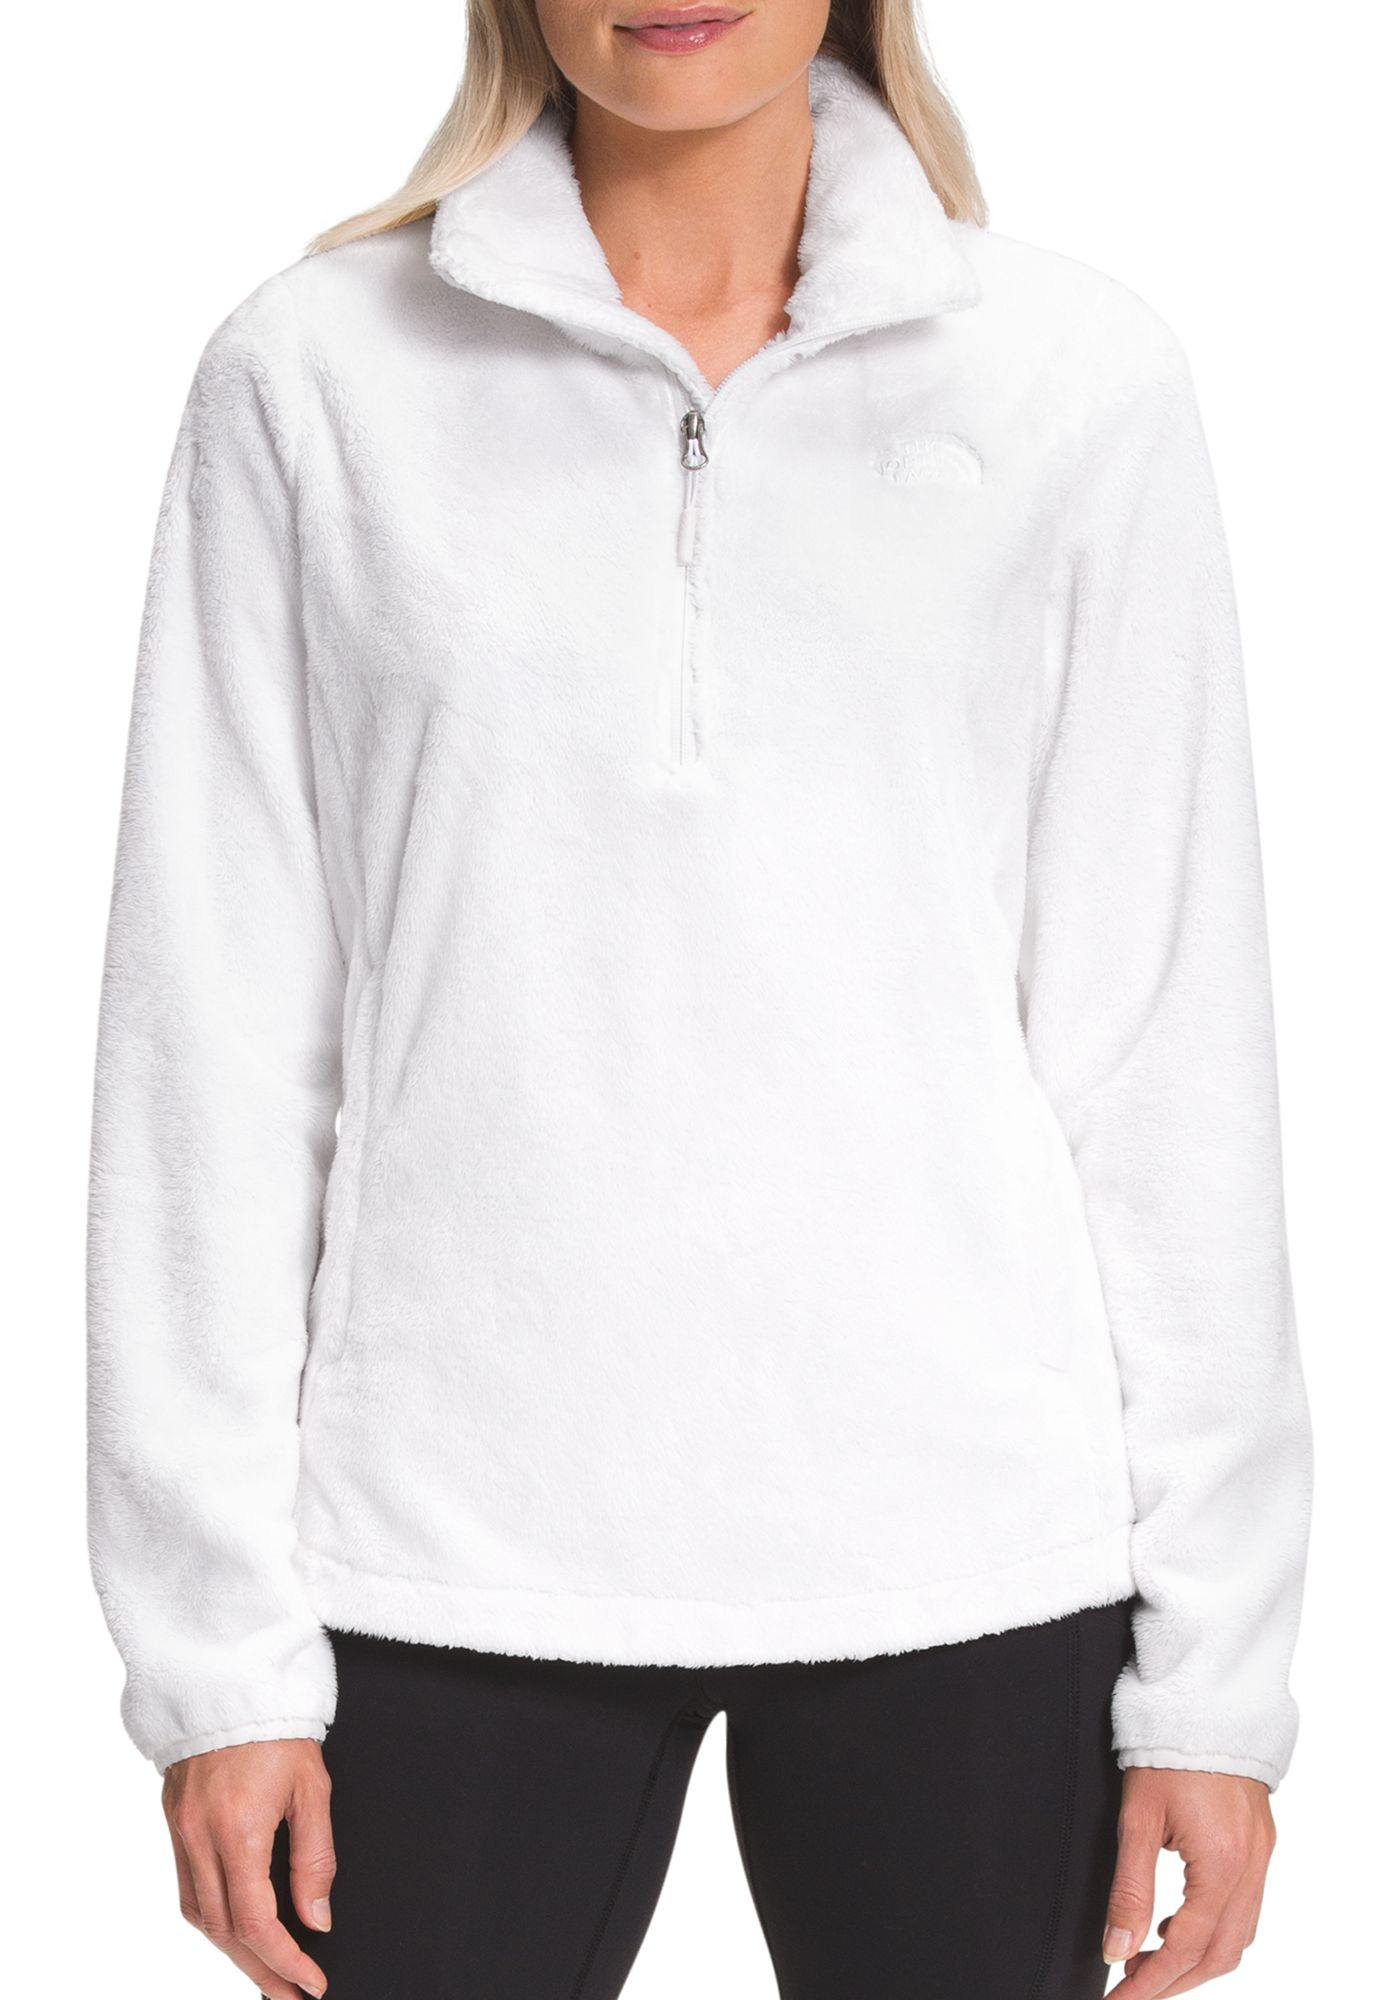 The North Face Women's Osito ¼ Zip Fleece Pullover